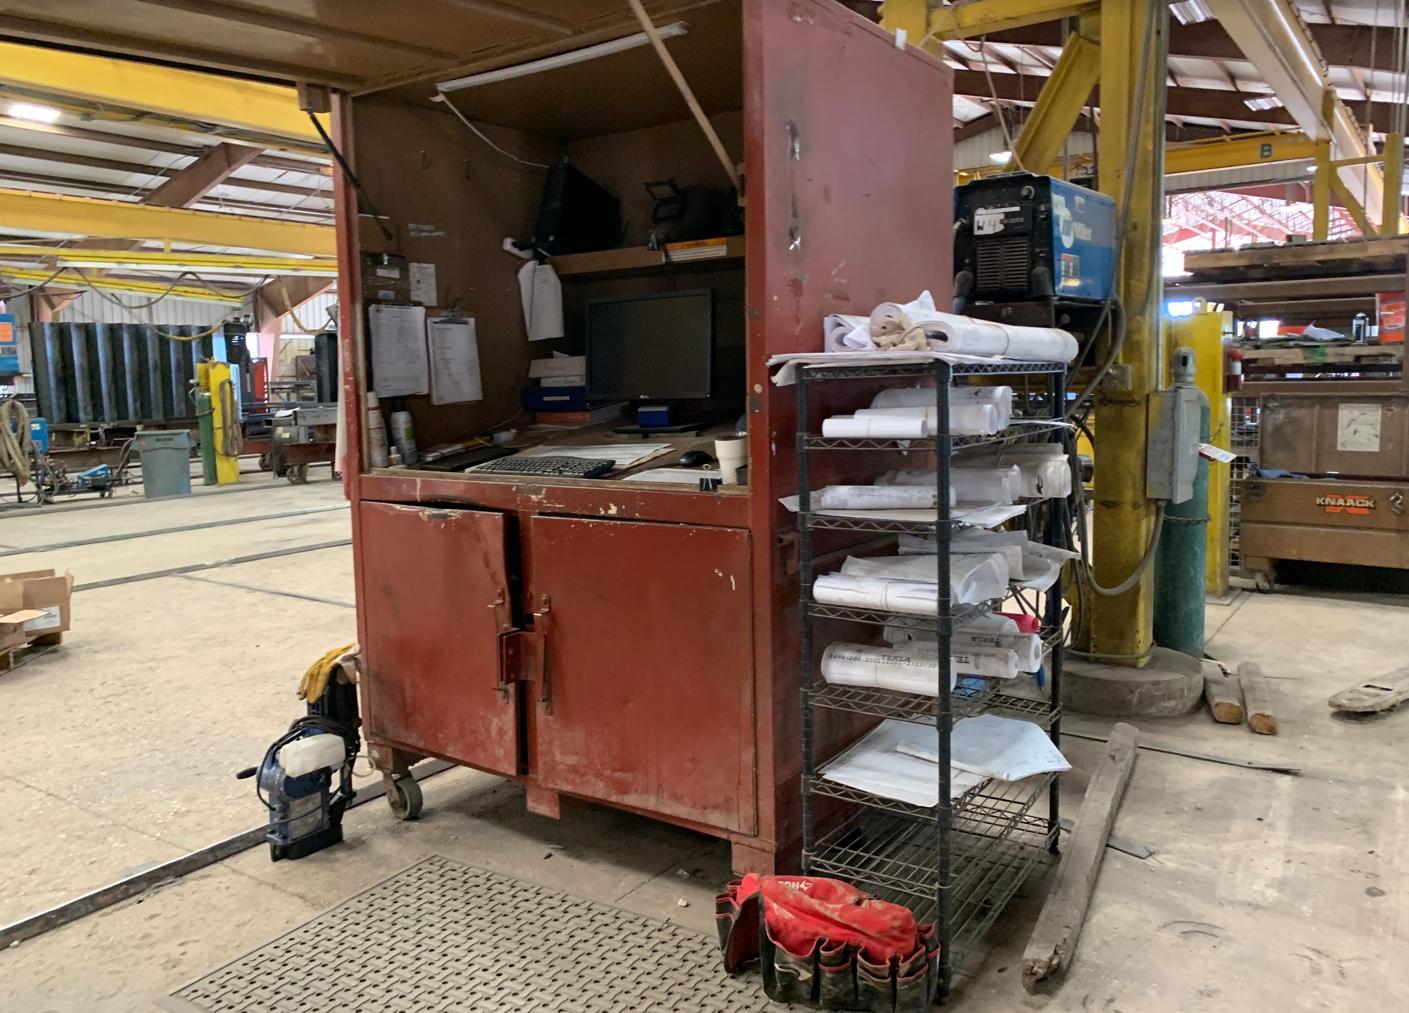 SteelDay 2019 - BIM station Fabrication Shop